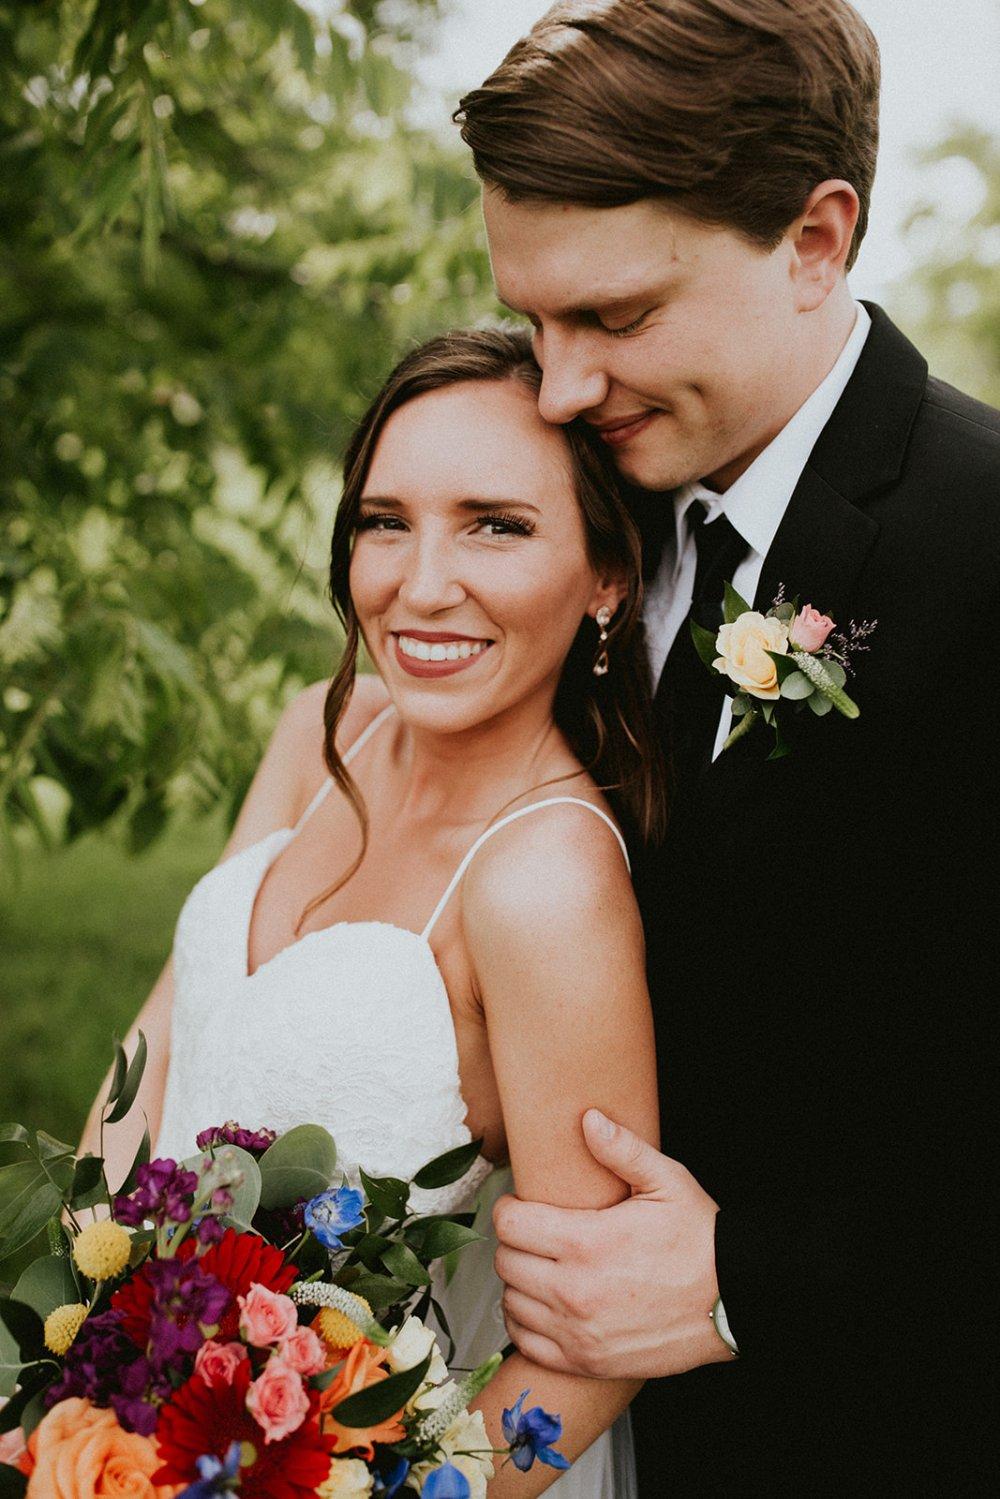 Calan-Adam-WEDDING-JUNE-2019-222.jpg